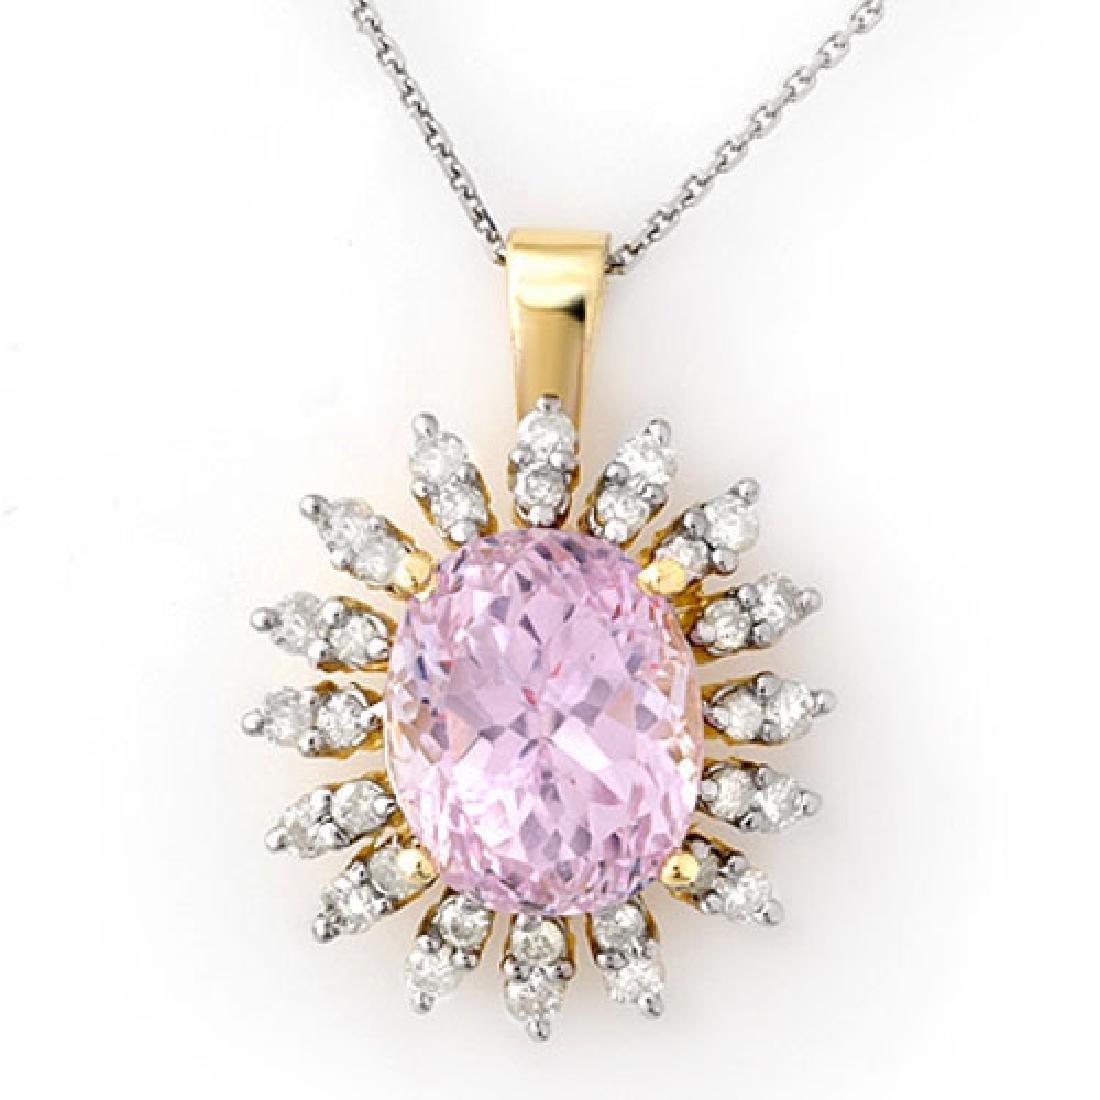 8.68 CTW Kunzite & Diamond Necklace 14K Yellow Gold